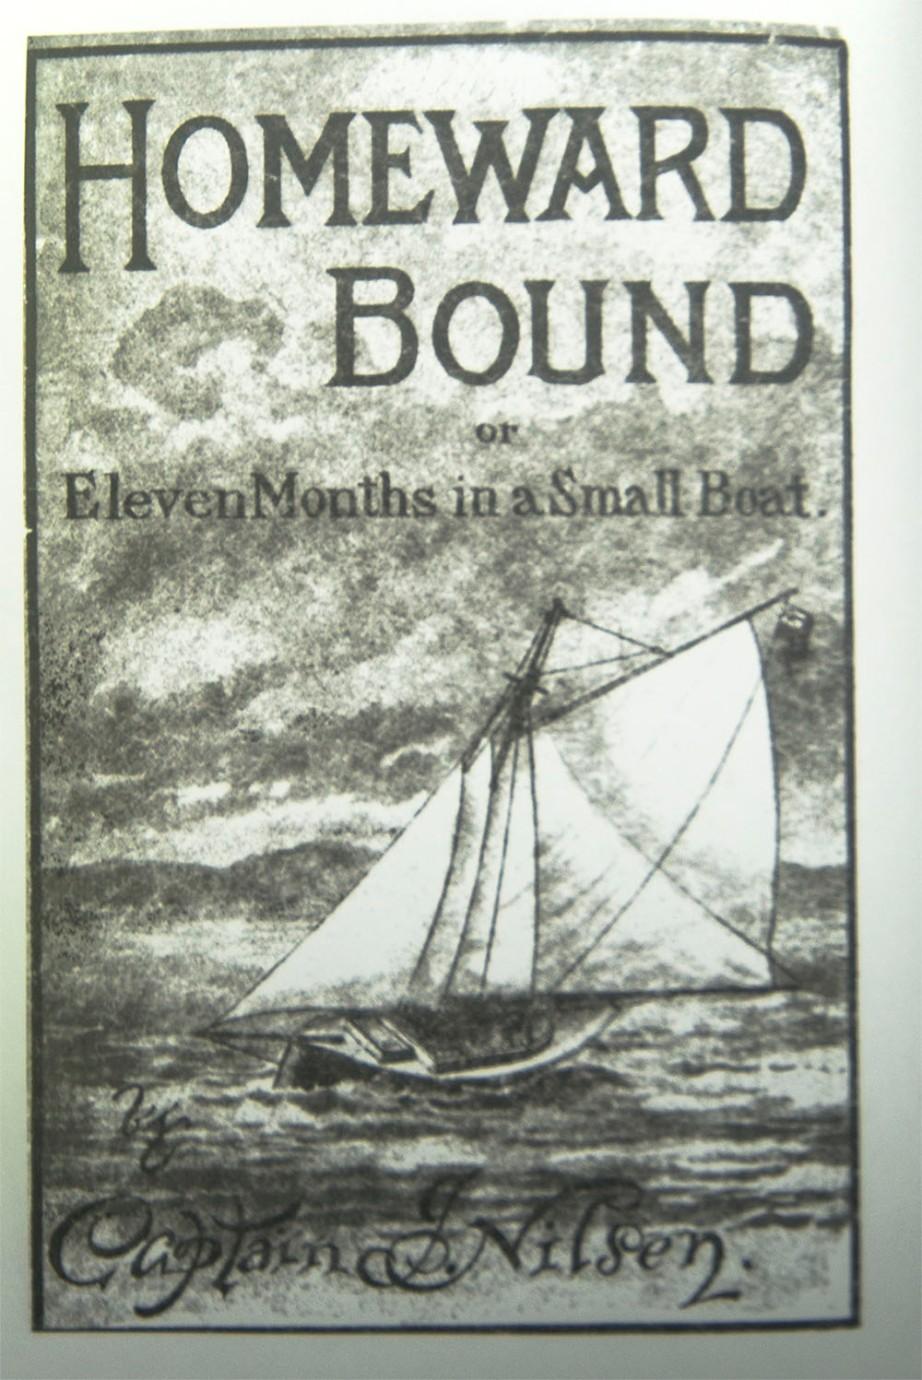 homeward-bound-ilustracion.JPG